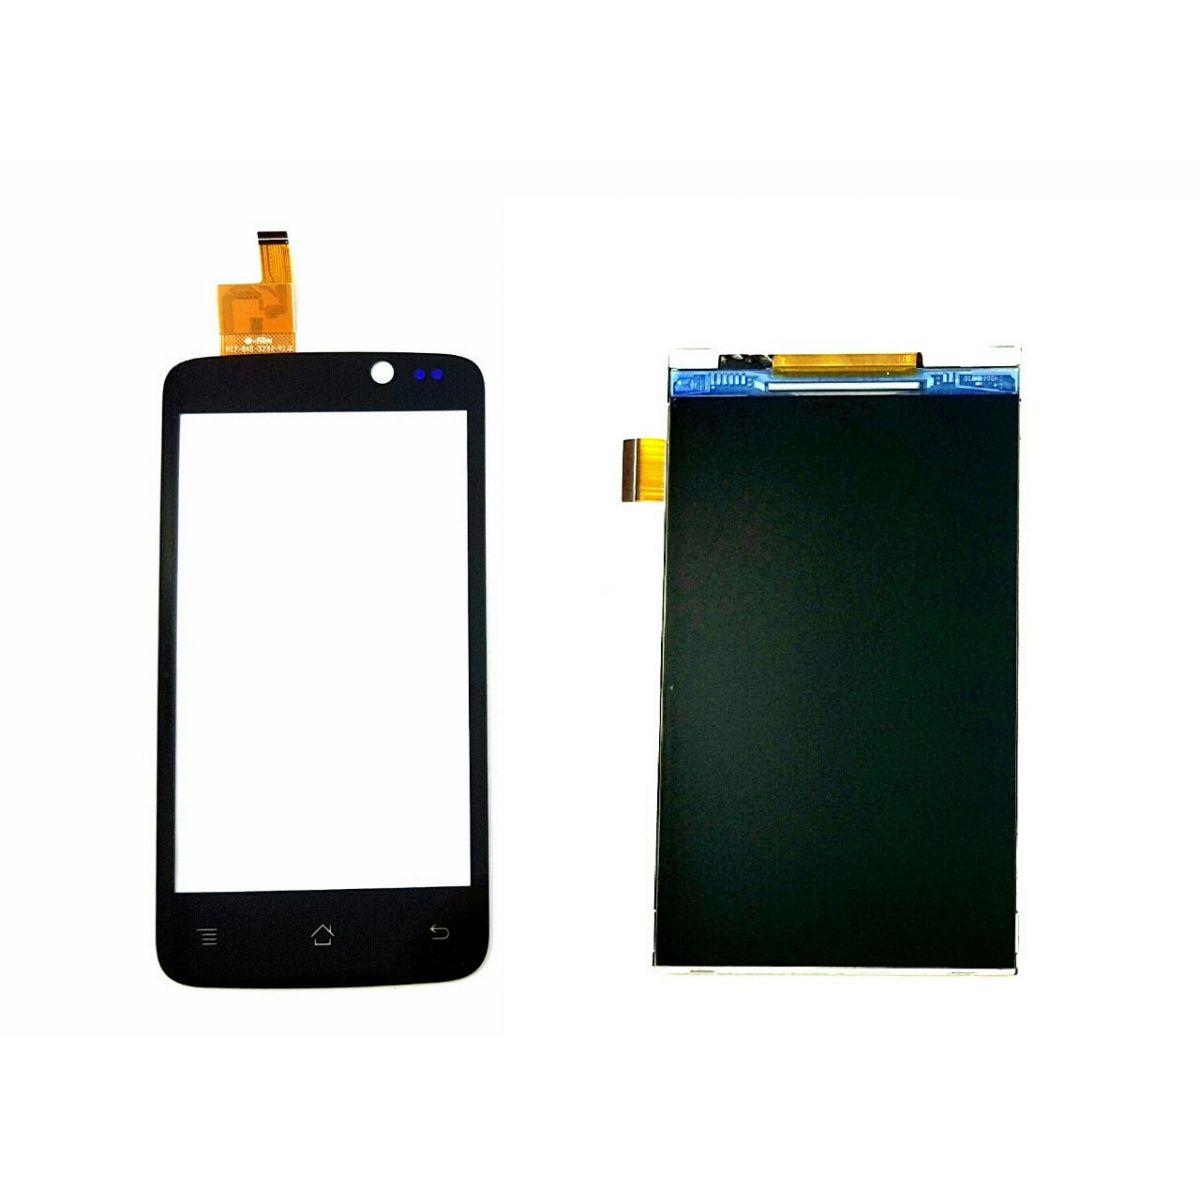 Kit Touch e Lcd Touch Blu Star S410 S410i Preto